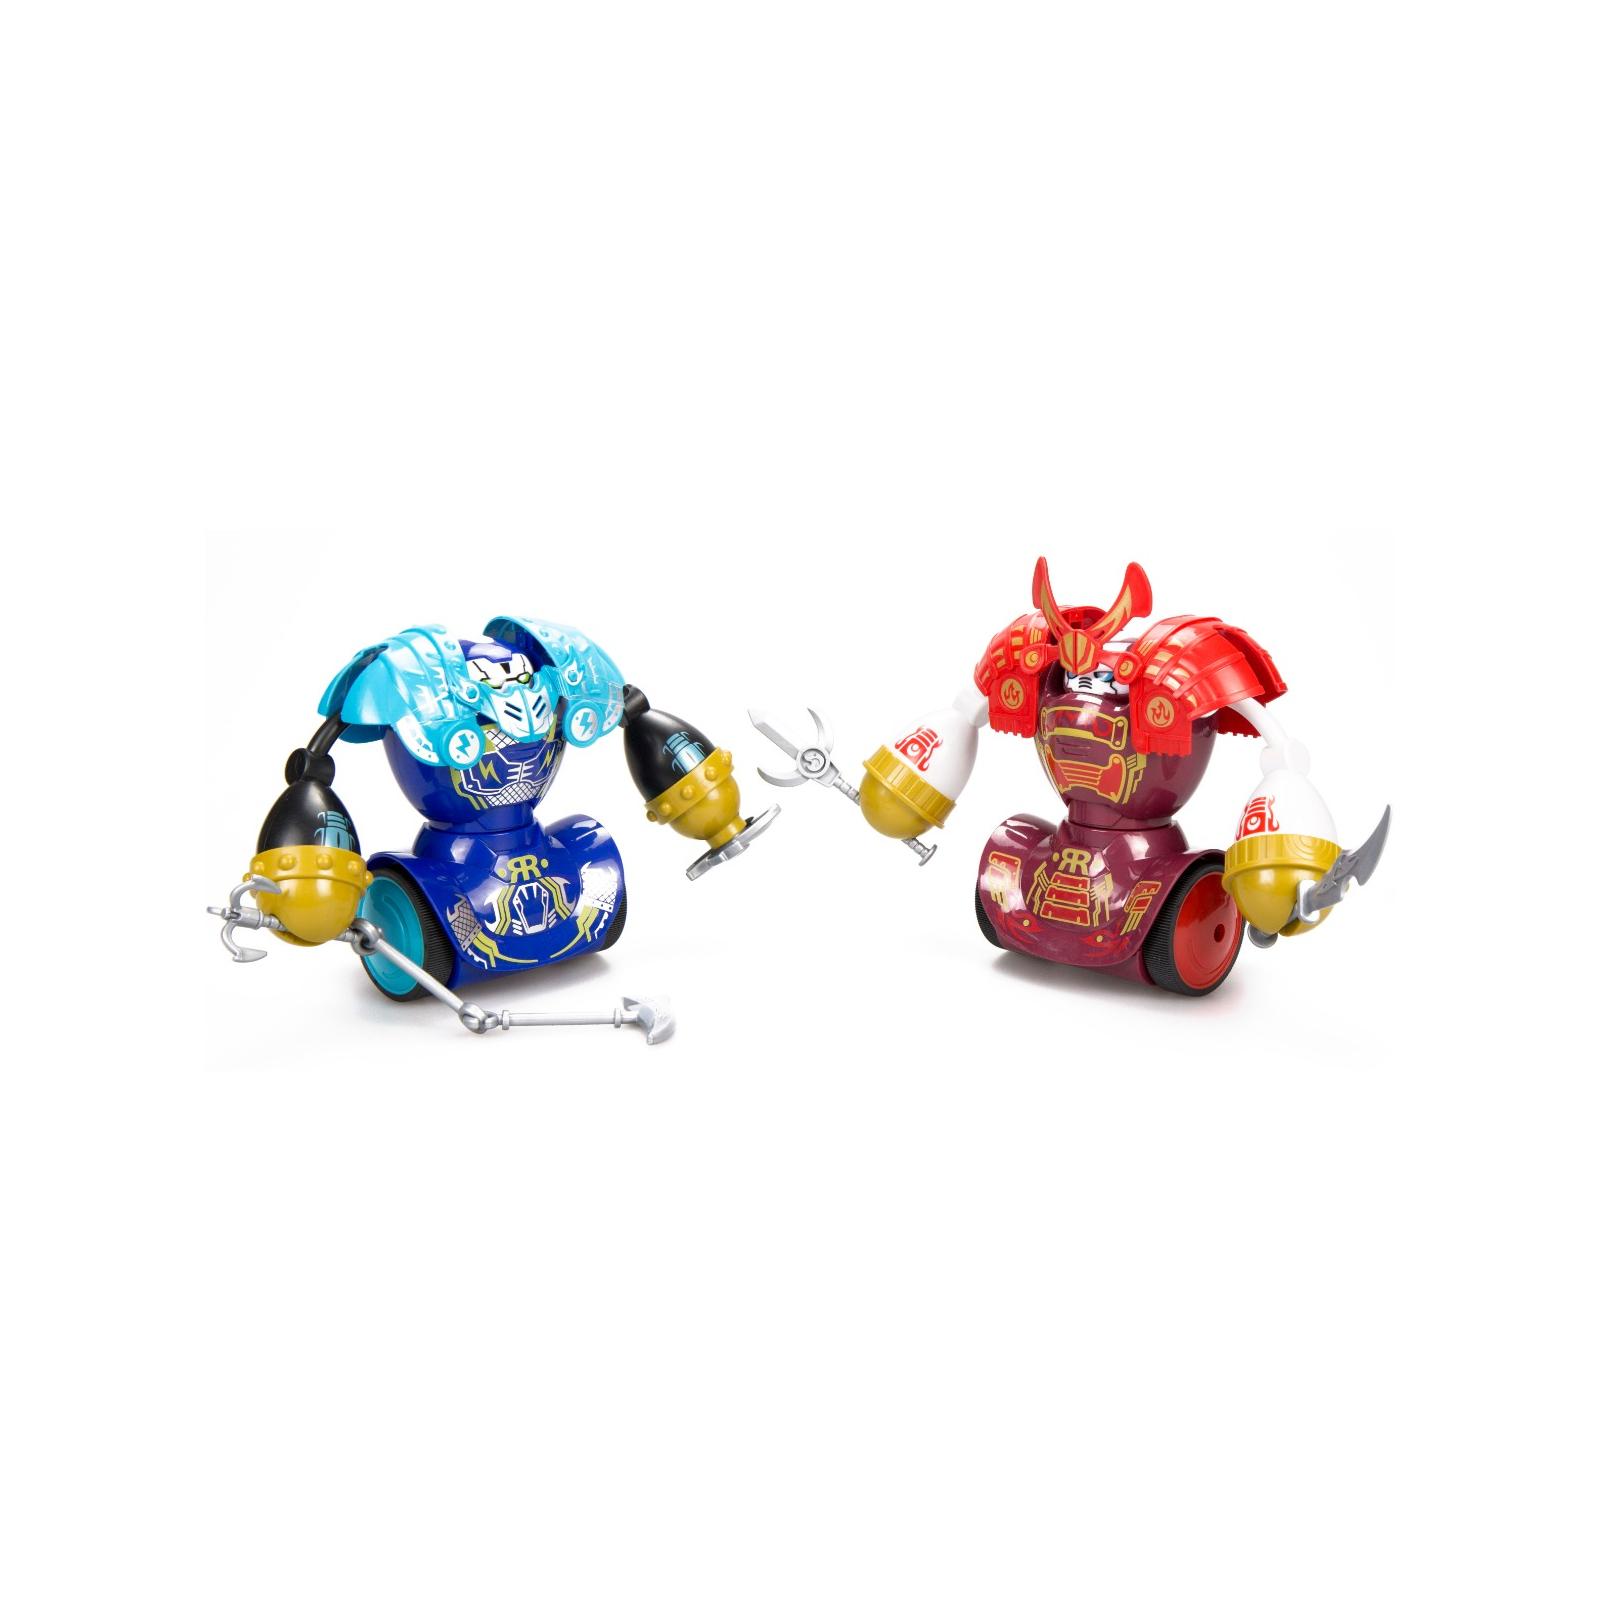 Интерактивная игрушка Silverlit Роботы-самураи (88056)